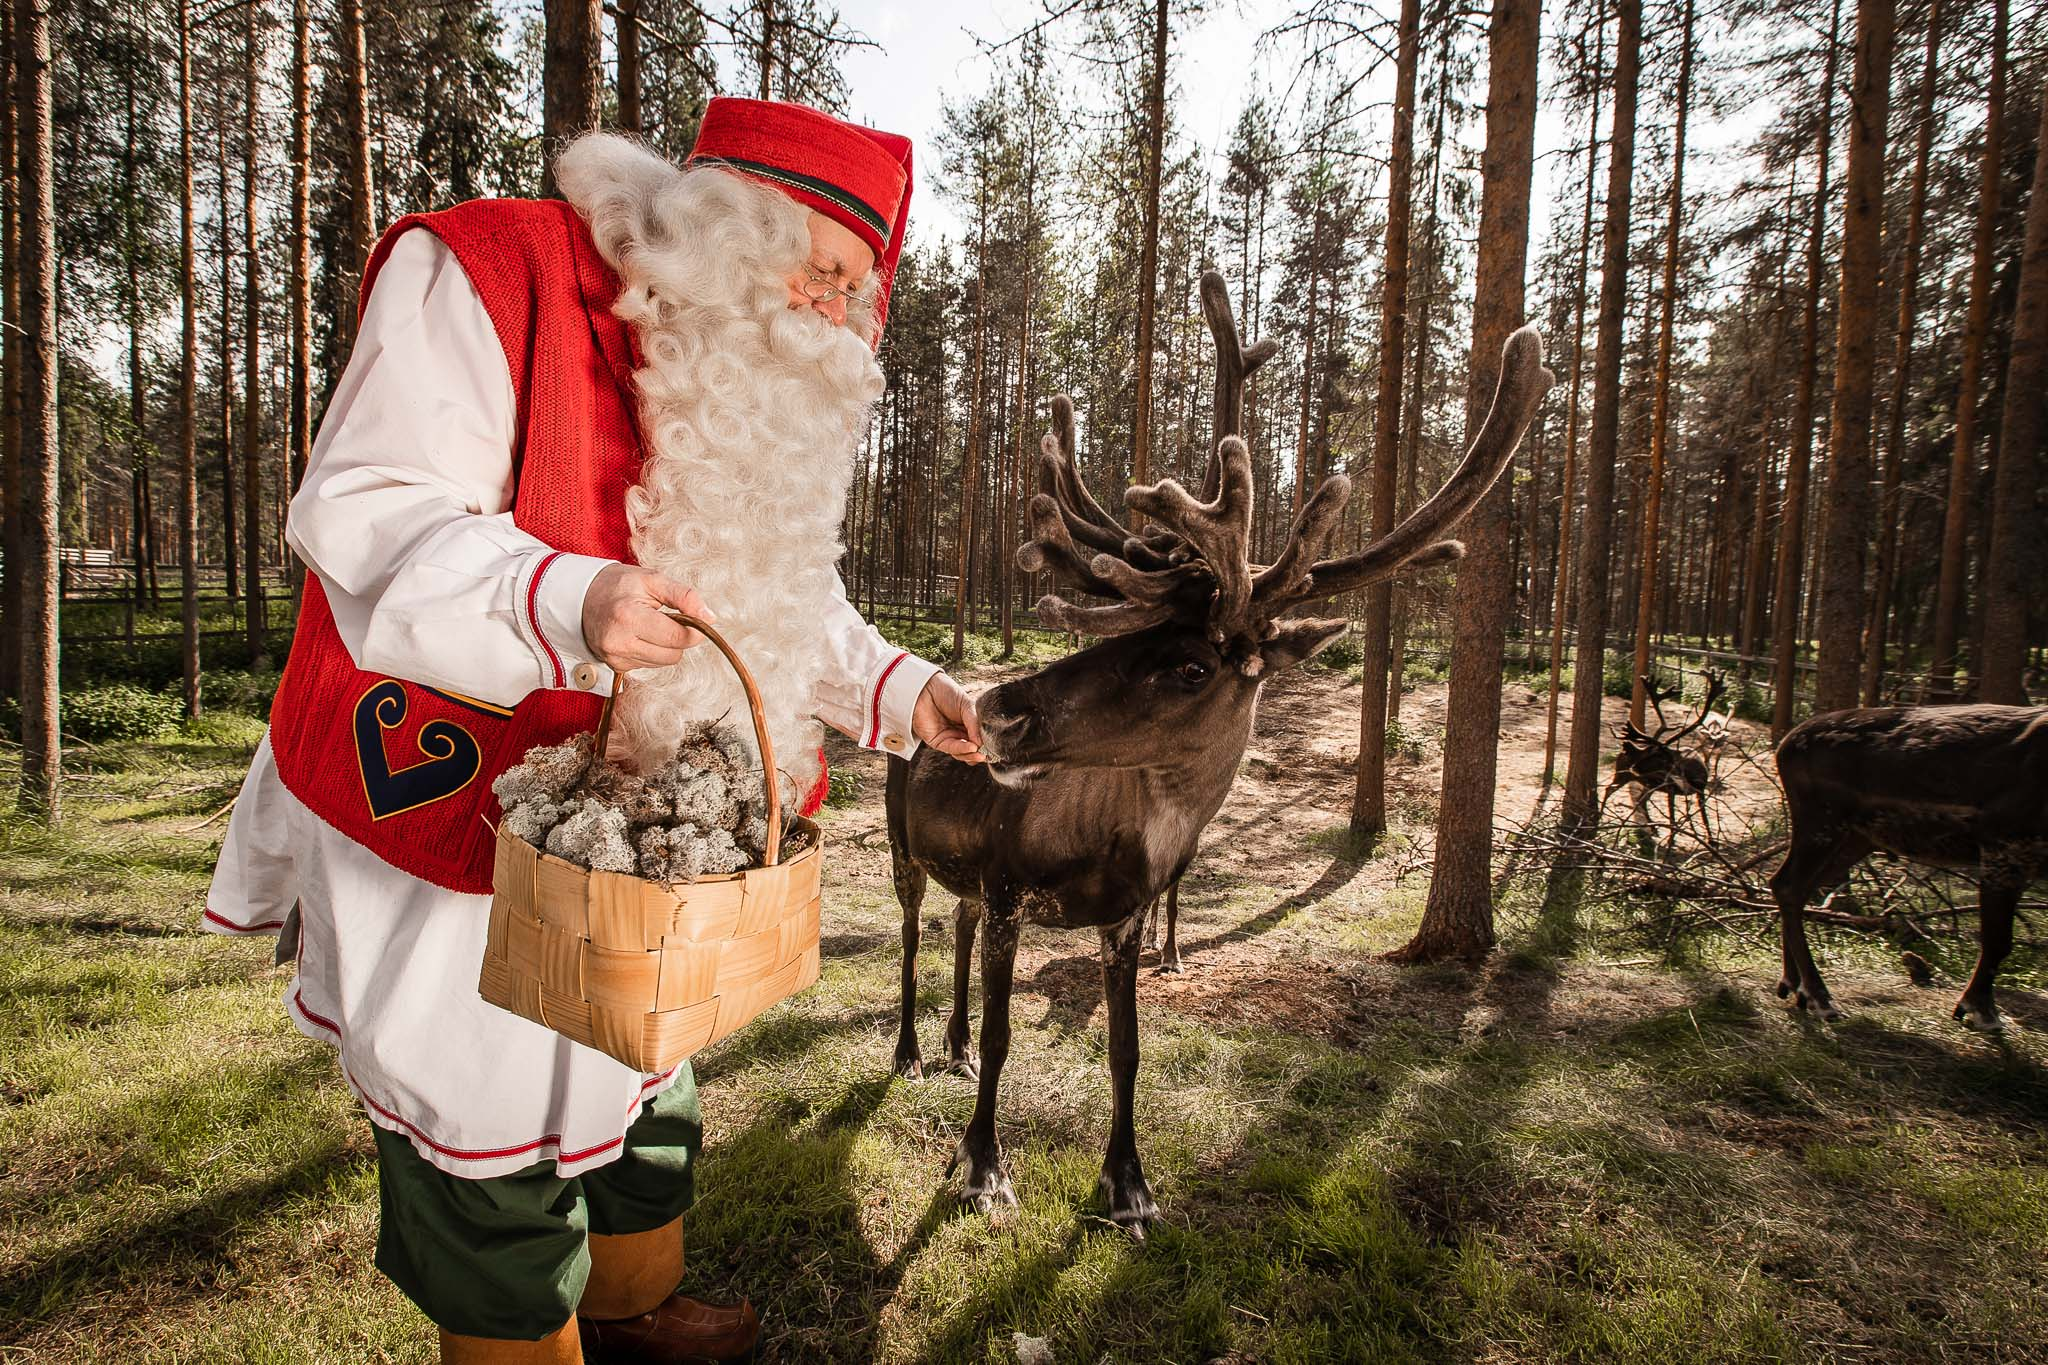 Santa Claus Feeding Reindeer Visit Rovaniemi Lapland Finland. Photo by Alexander Kuznetsov / All About Lapland